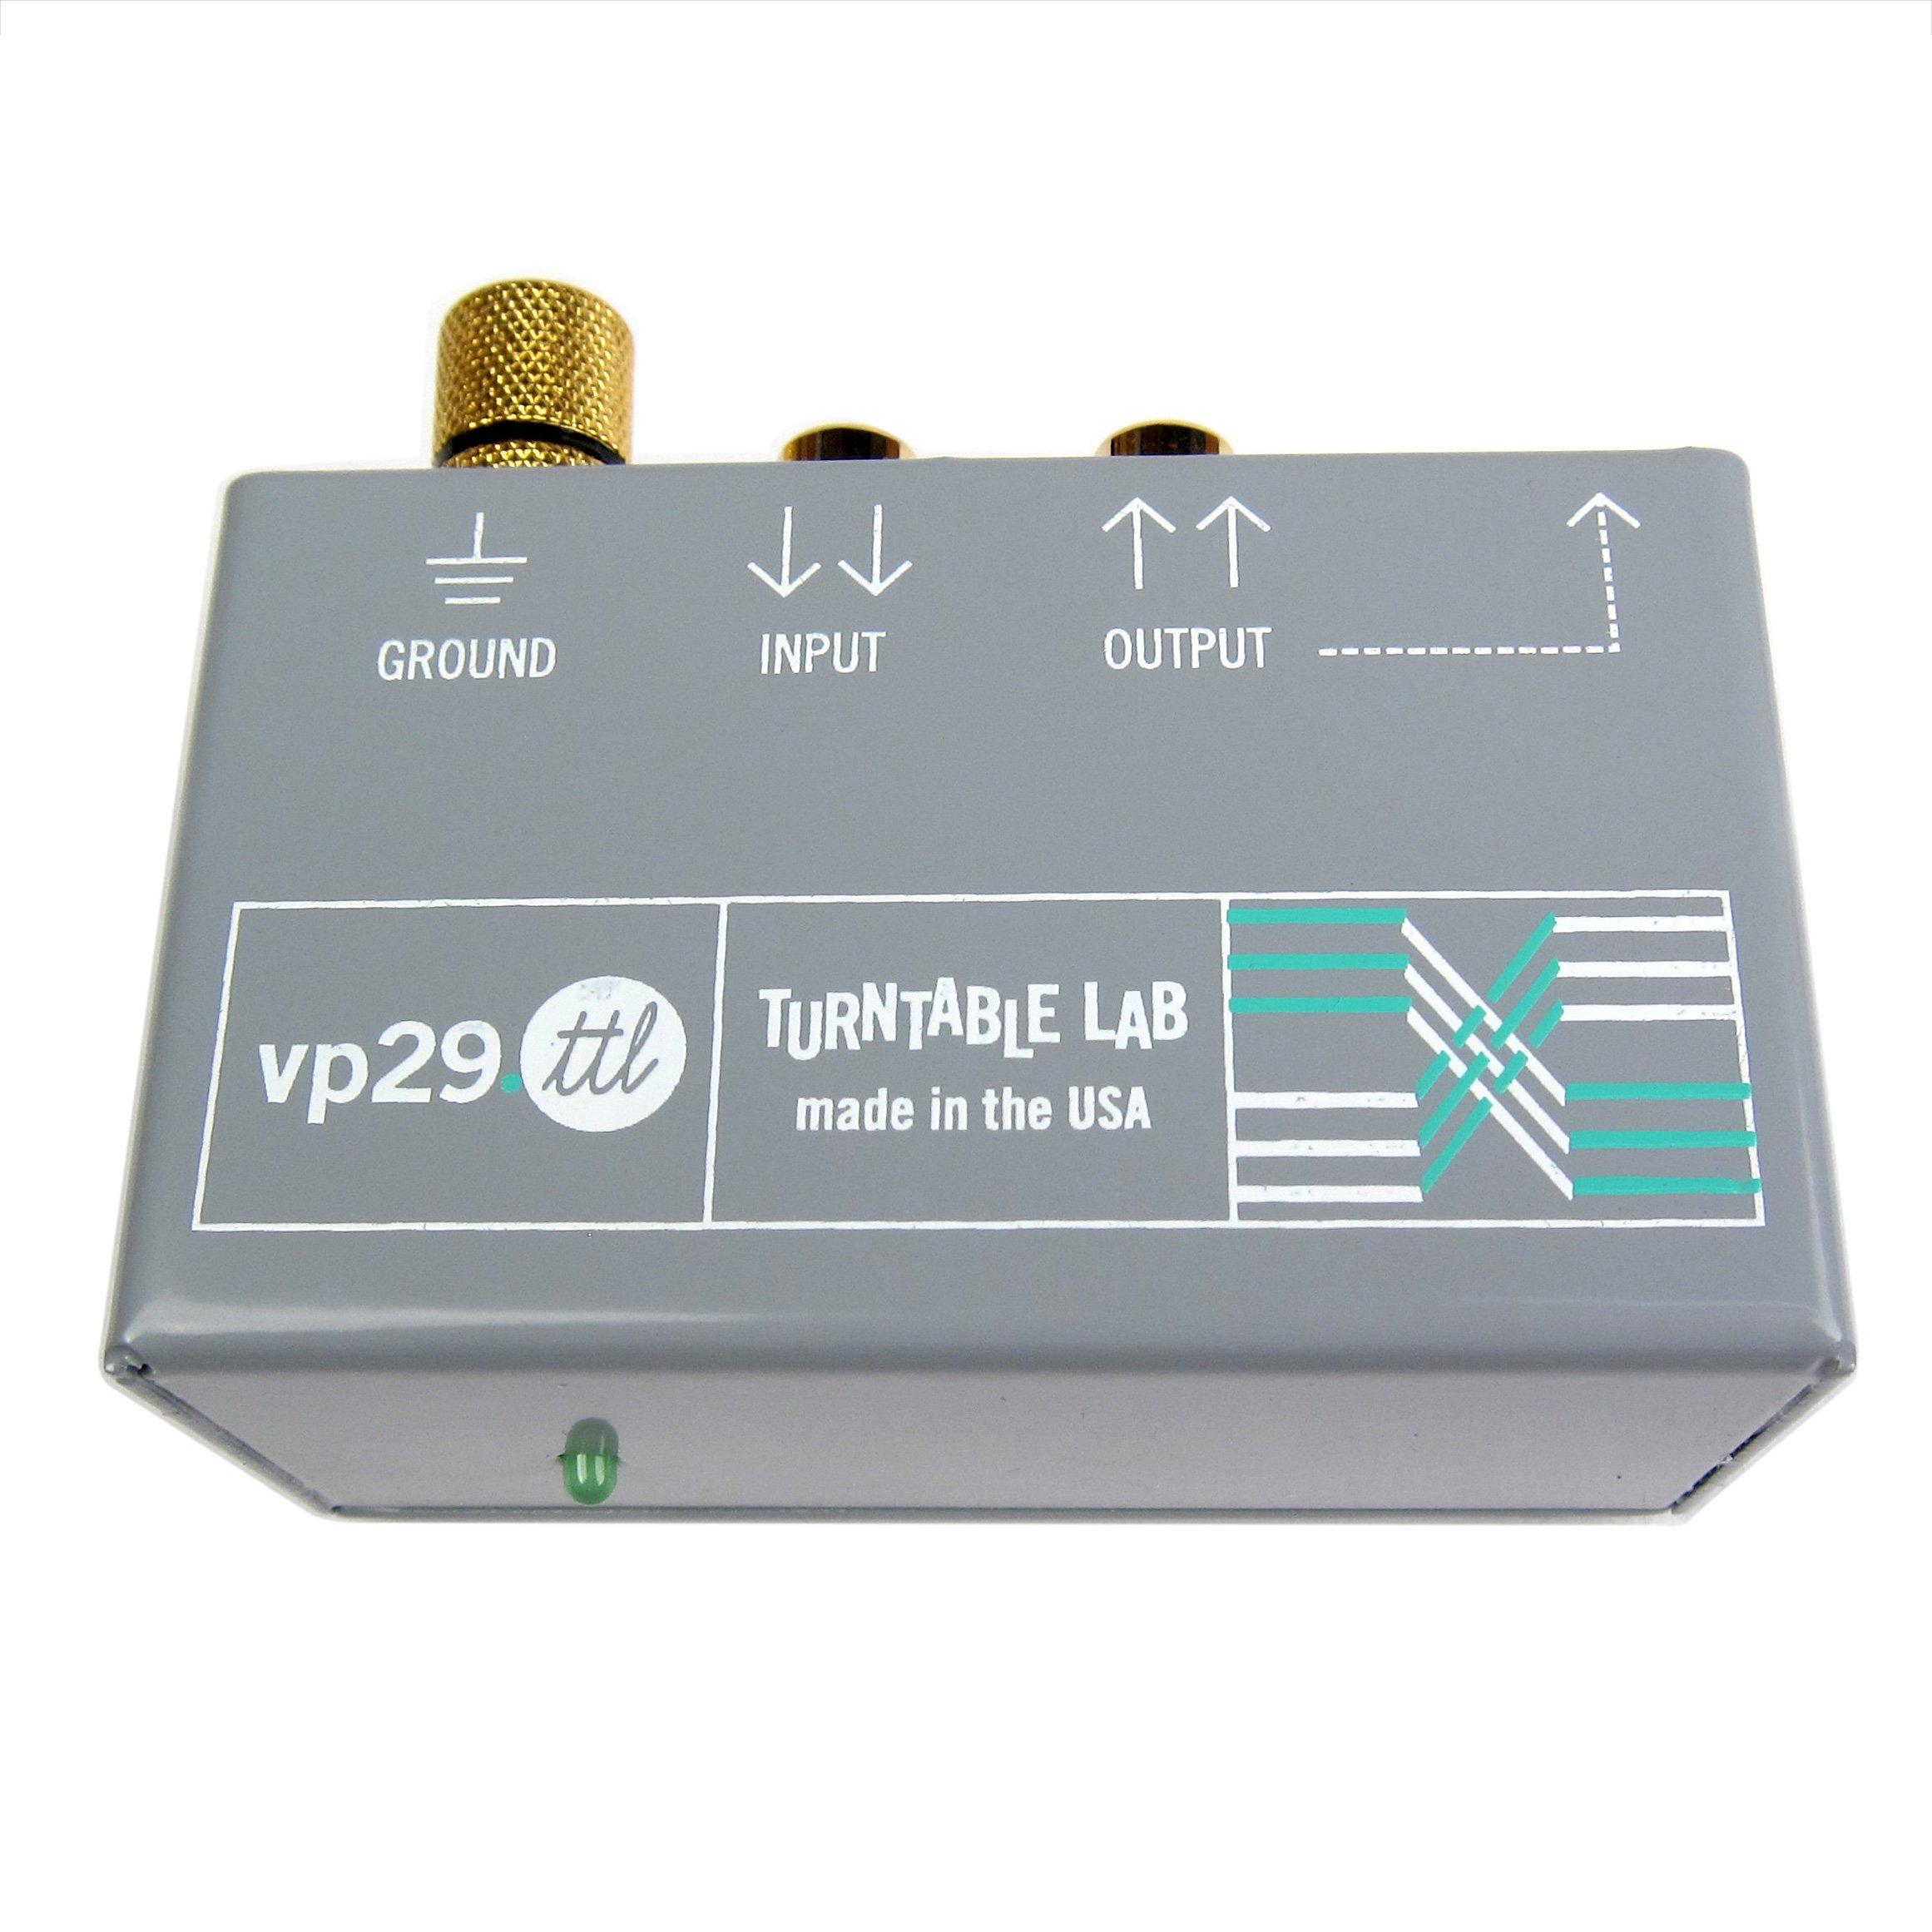 Turntable Lab: Rolls VP 29.TTL Phono Preamp - Turntable Lab Edition by Turntable Lab